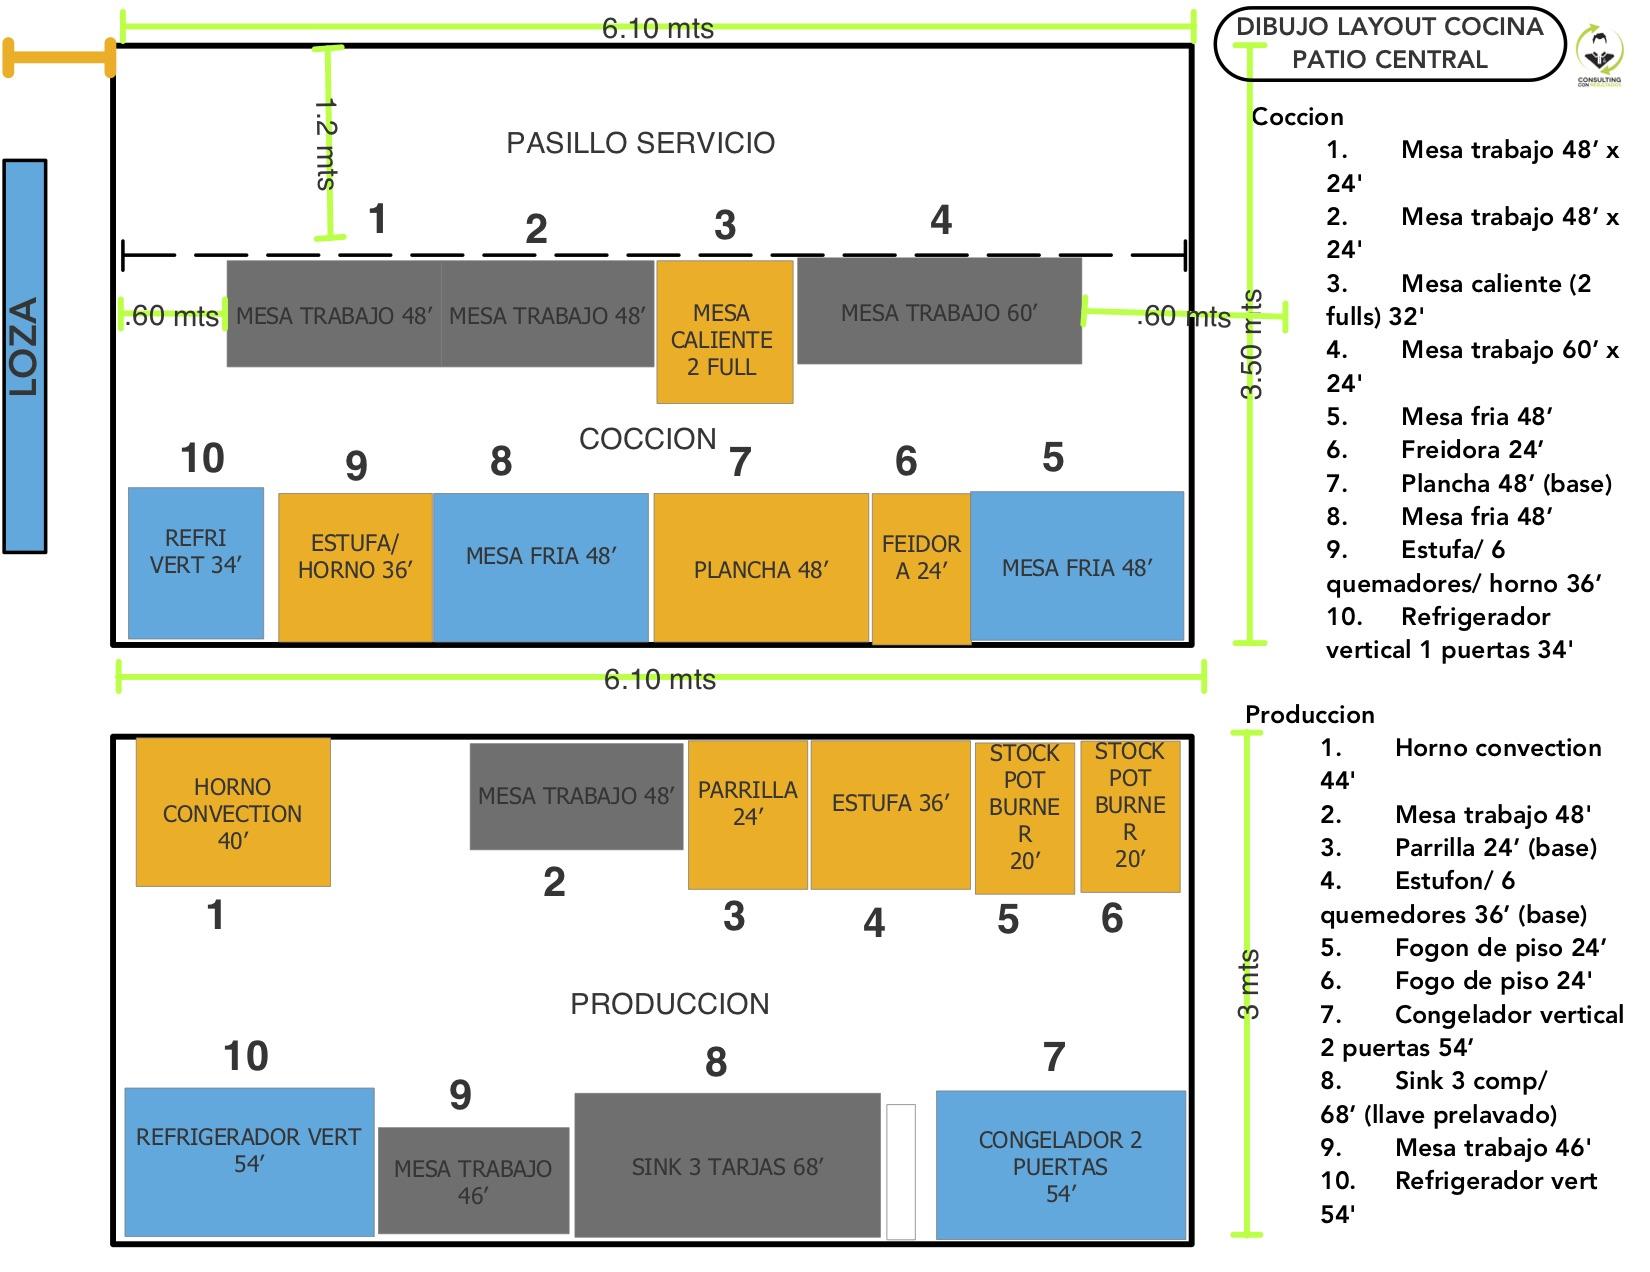 Dibujo inicial layout cocina